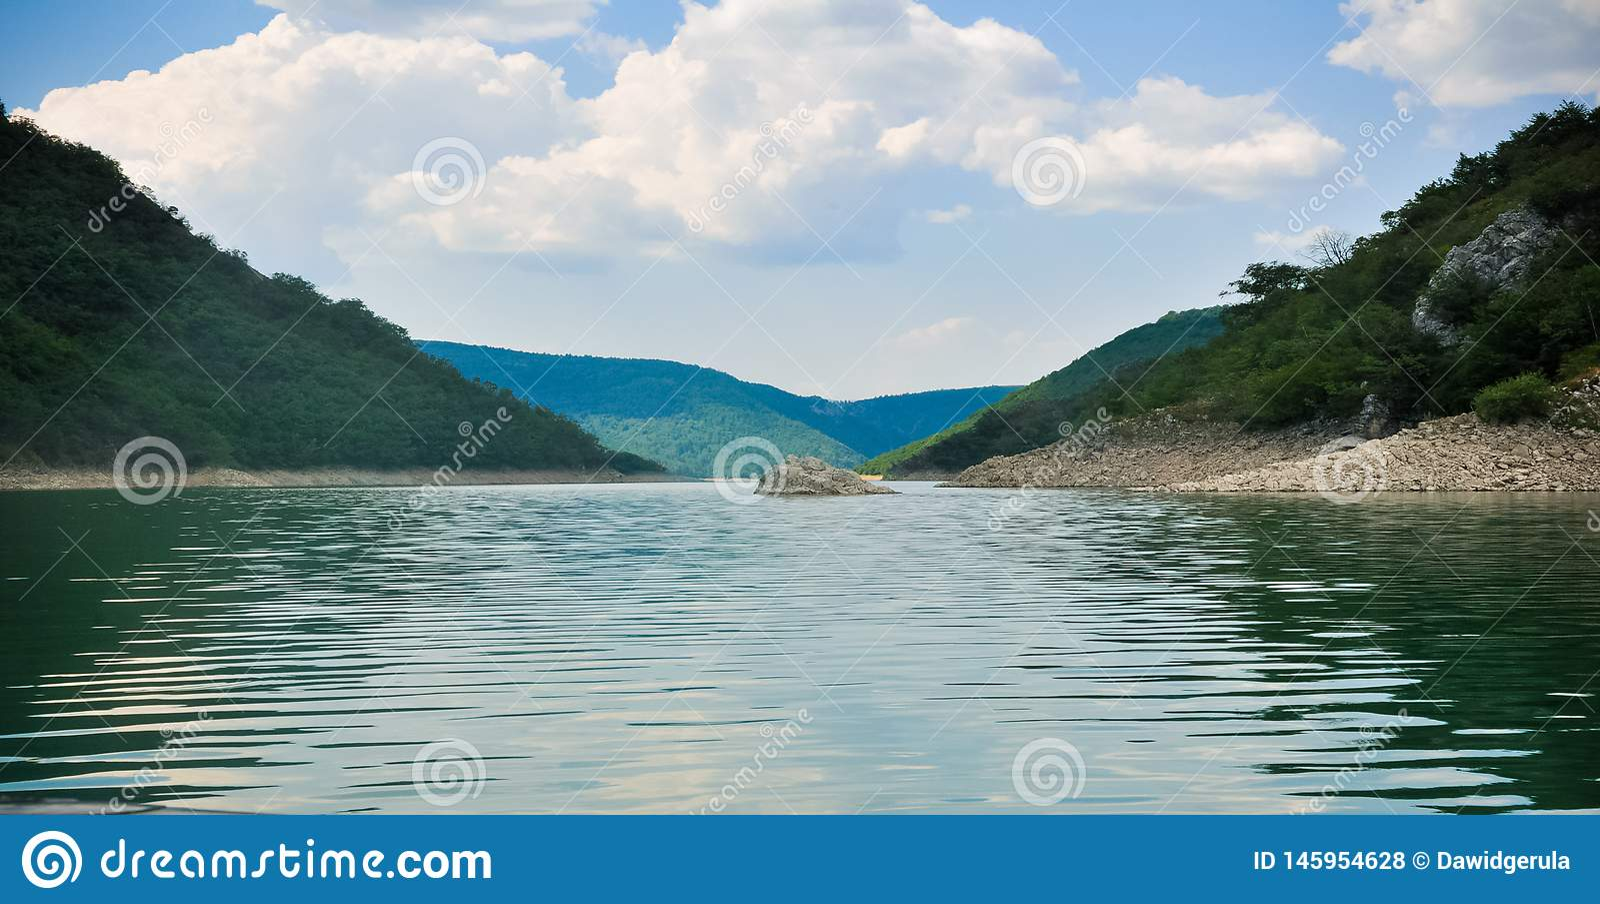 Zaovine See in breiter Fotografie Serbiens